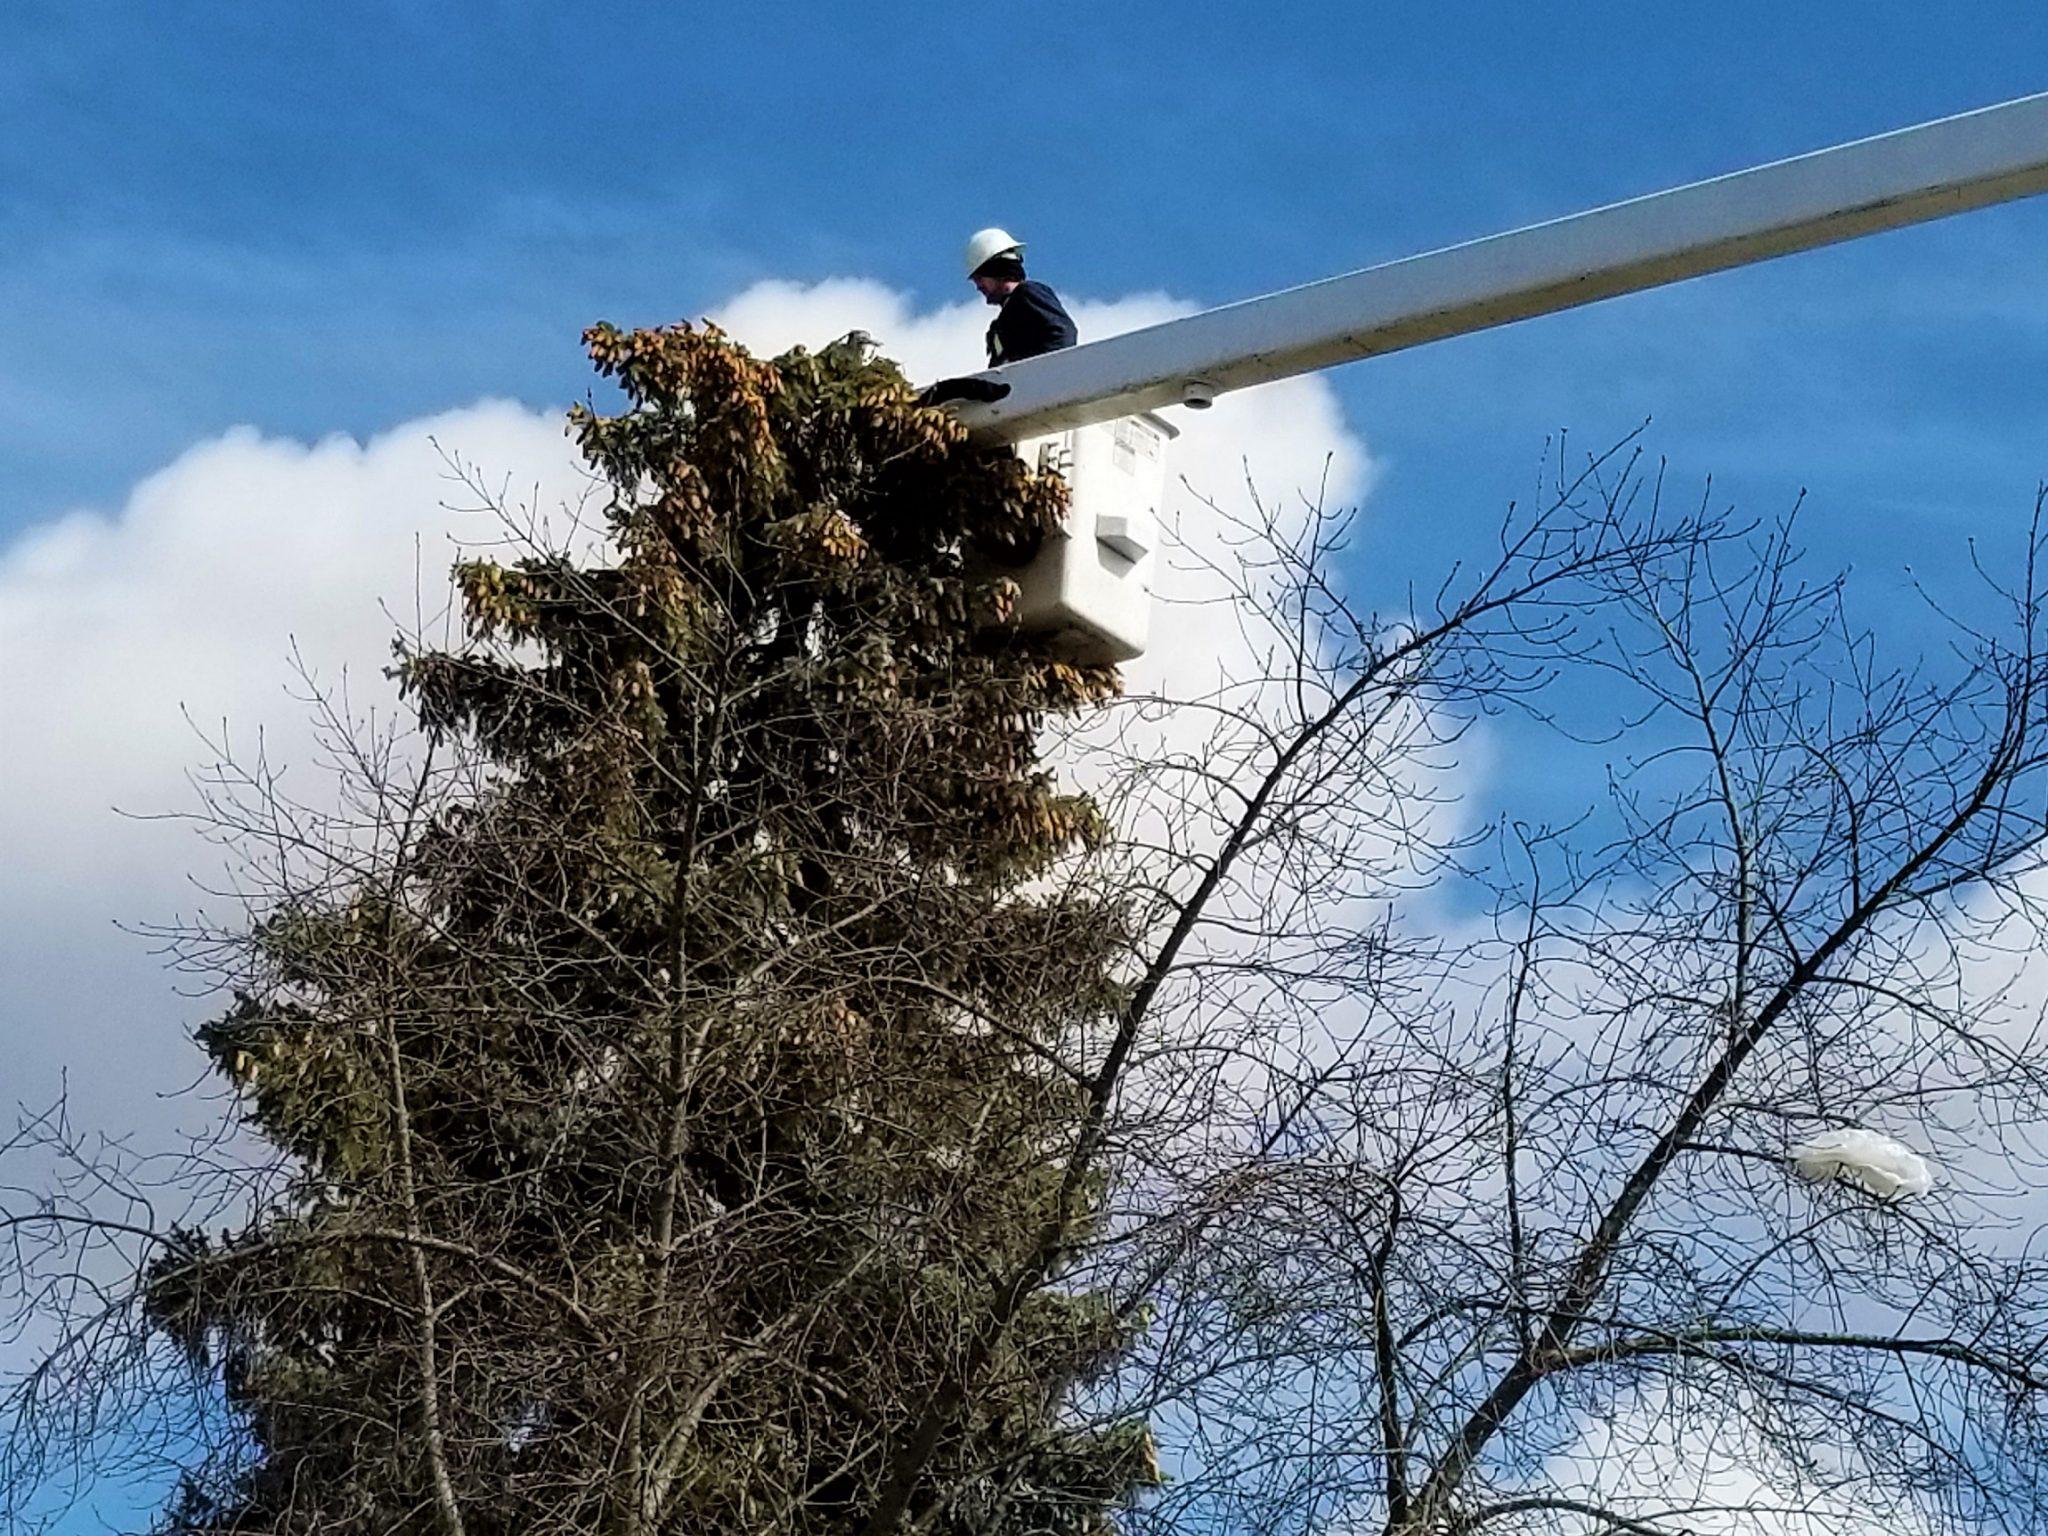 tree-services-brampton